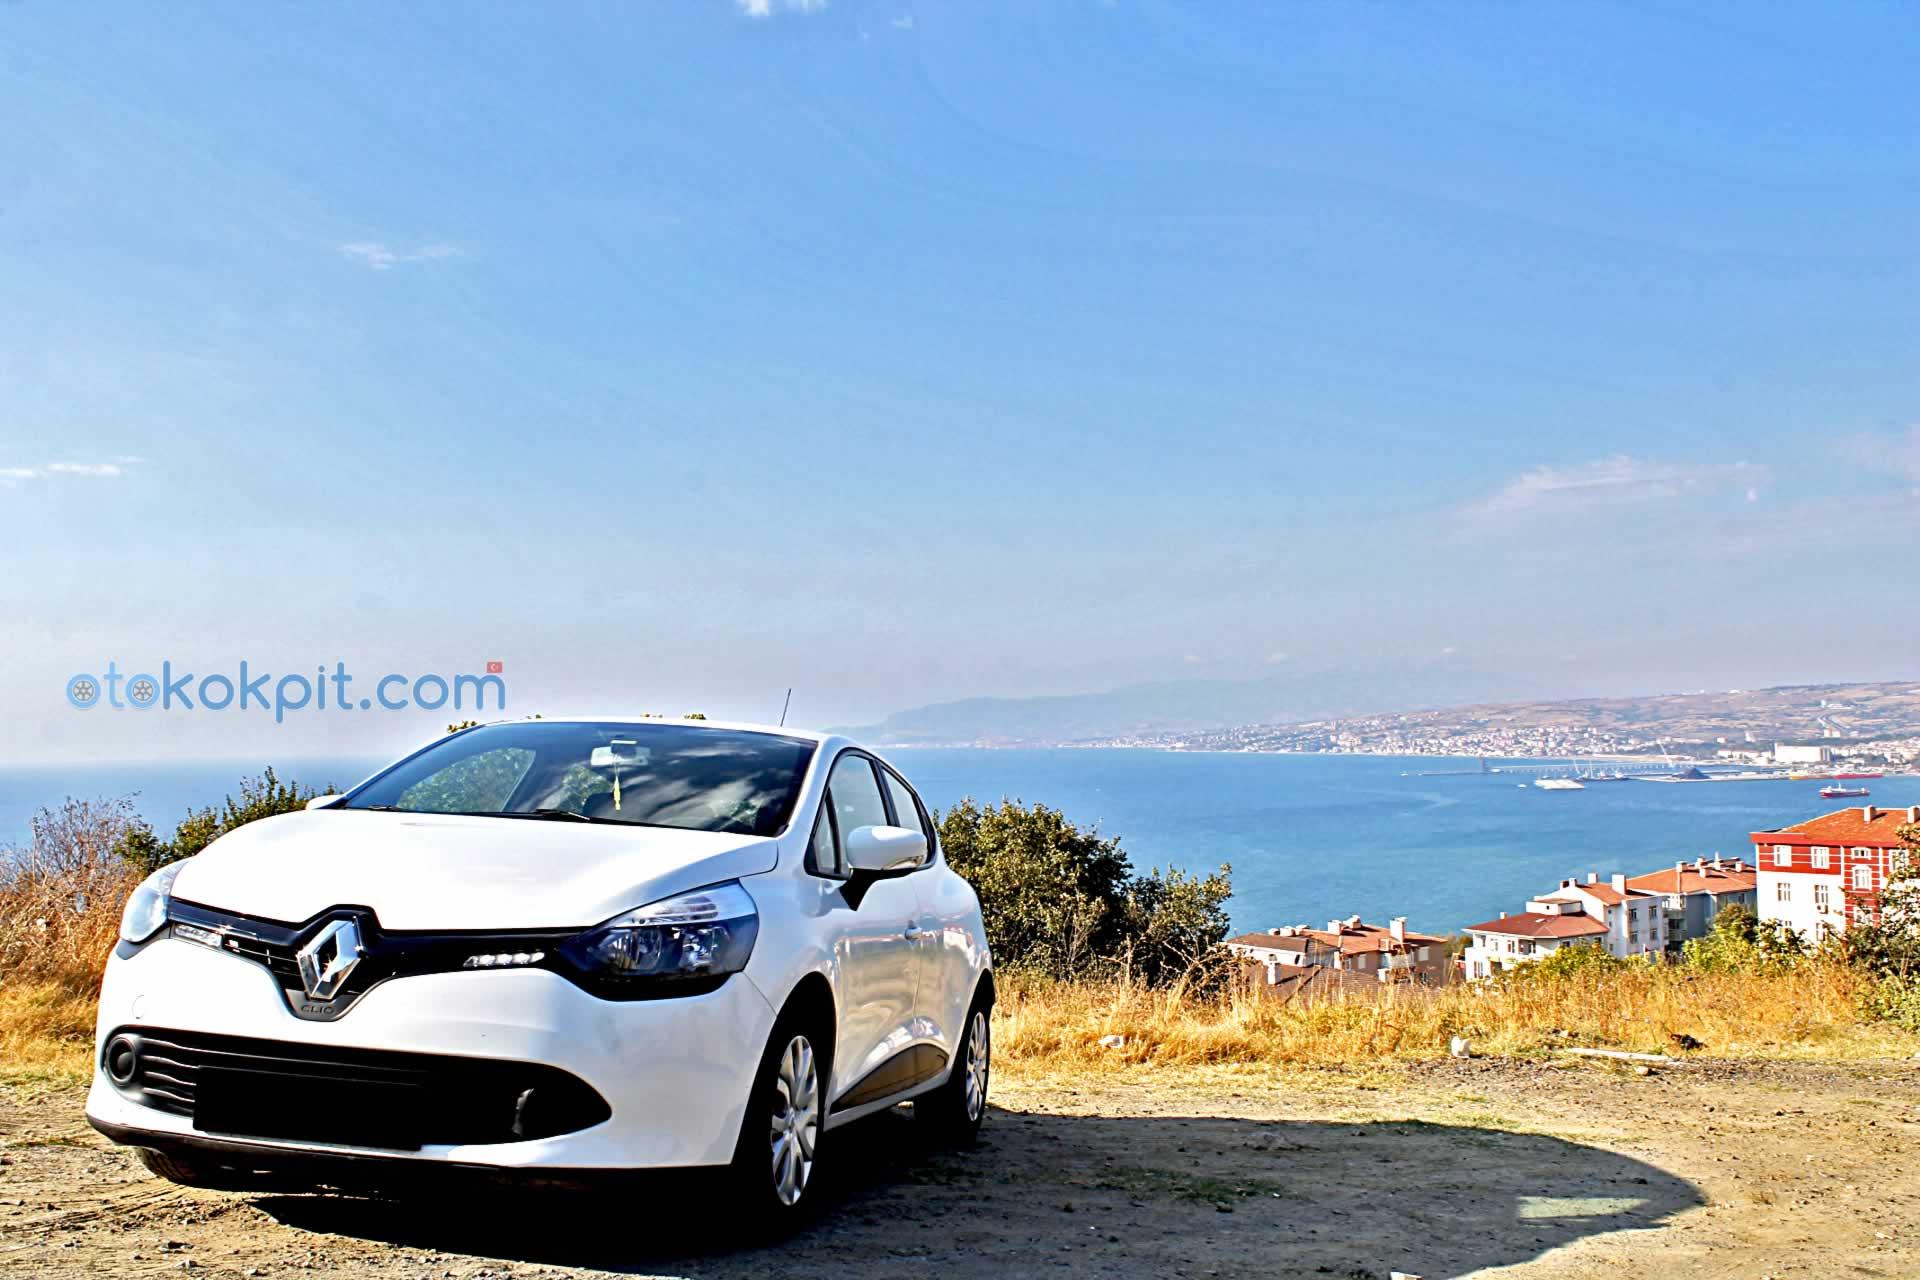 Yeni Renault Clio 4 Joy 1.5 dCi Fiyatı